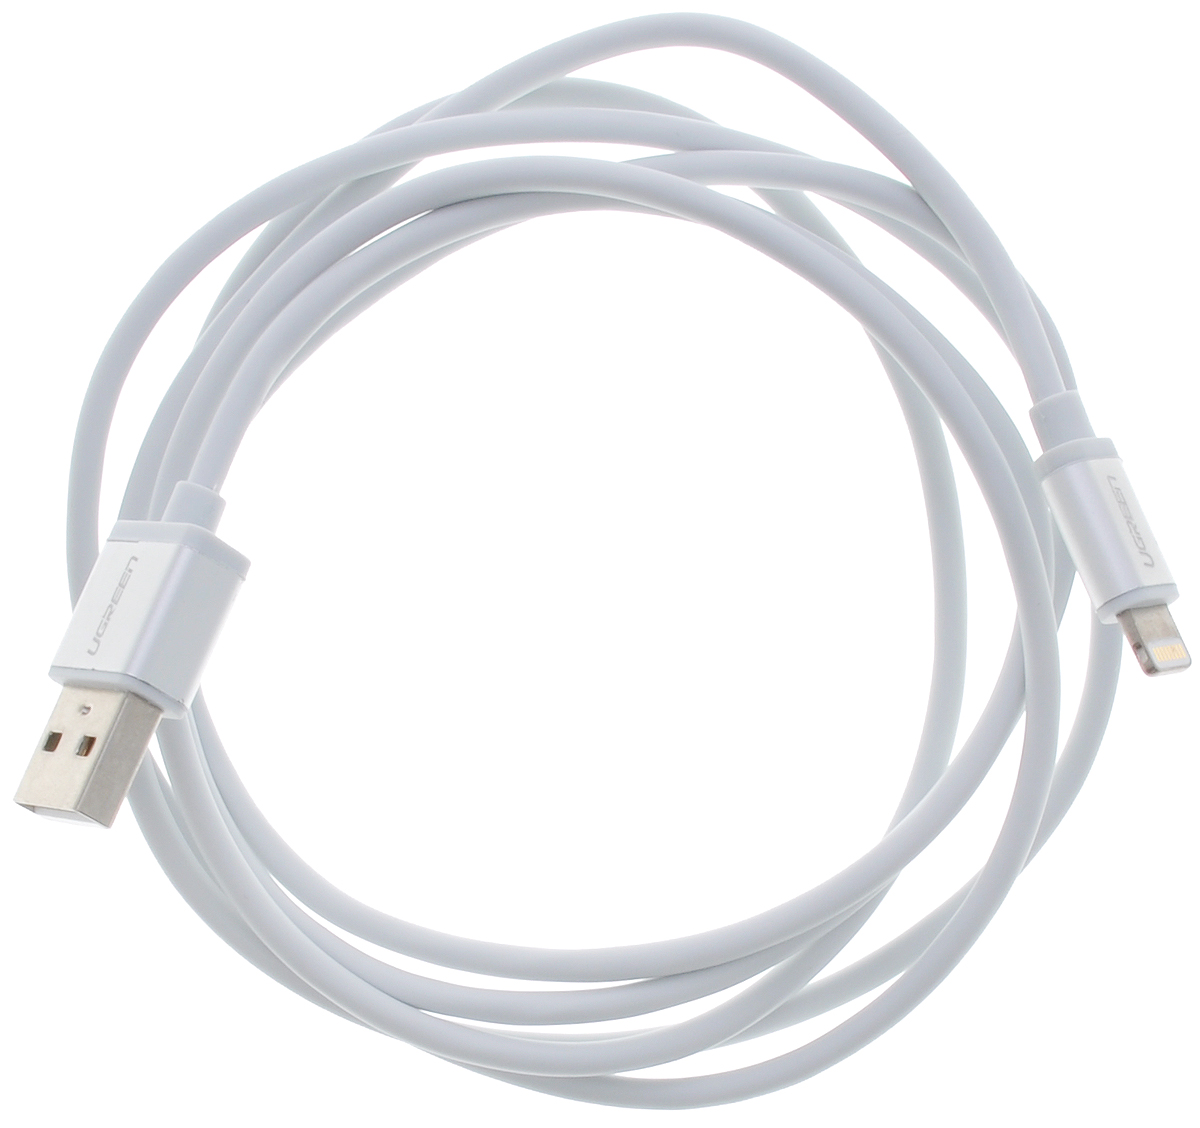 Фото Ugreen UG-10812, White Silver кабель-переходник USB 1 м